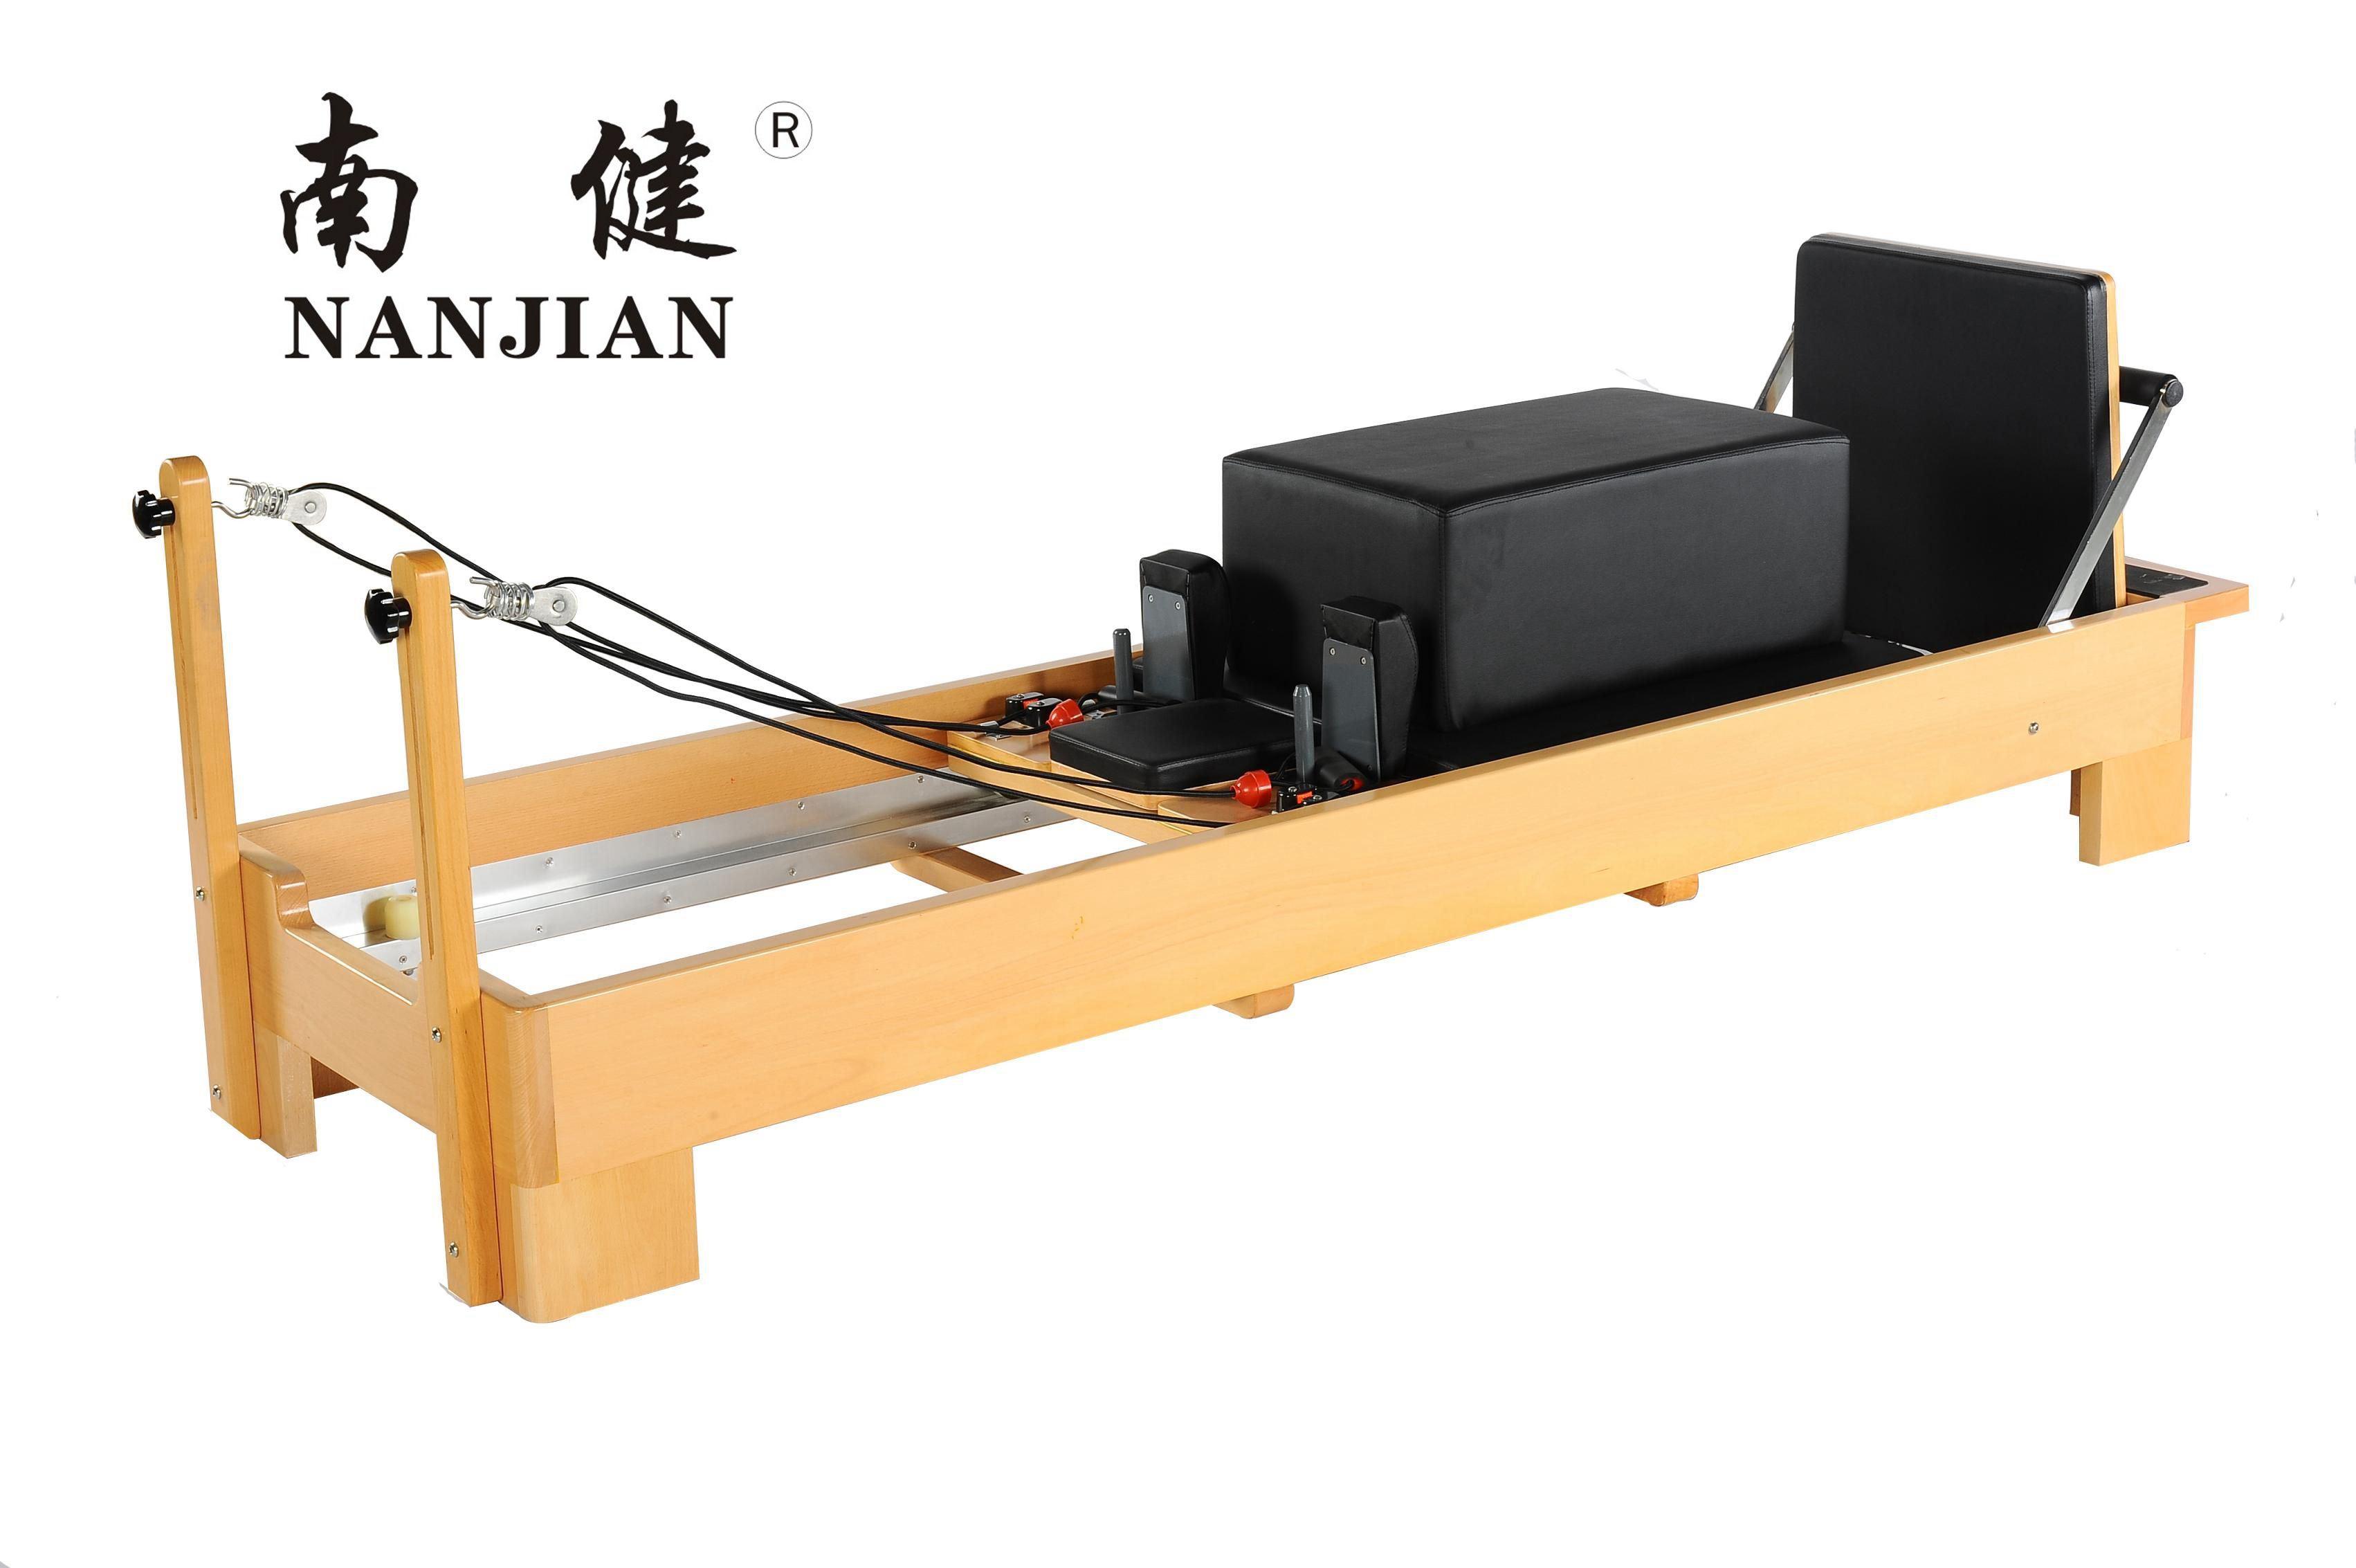 Nanjian High Quality Beech/Maple Wood Pilates Reformer